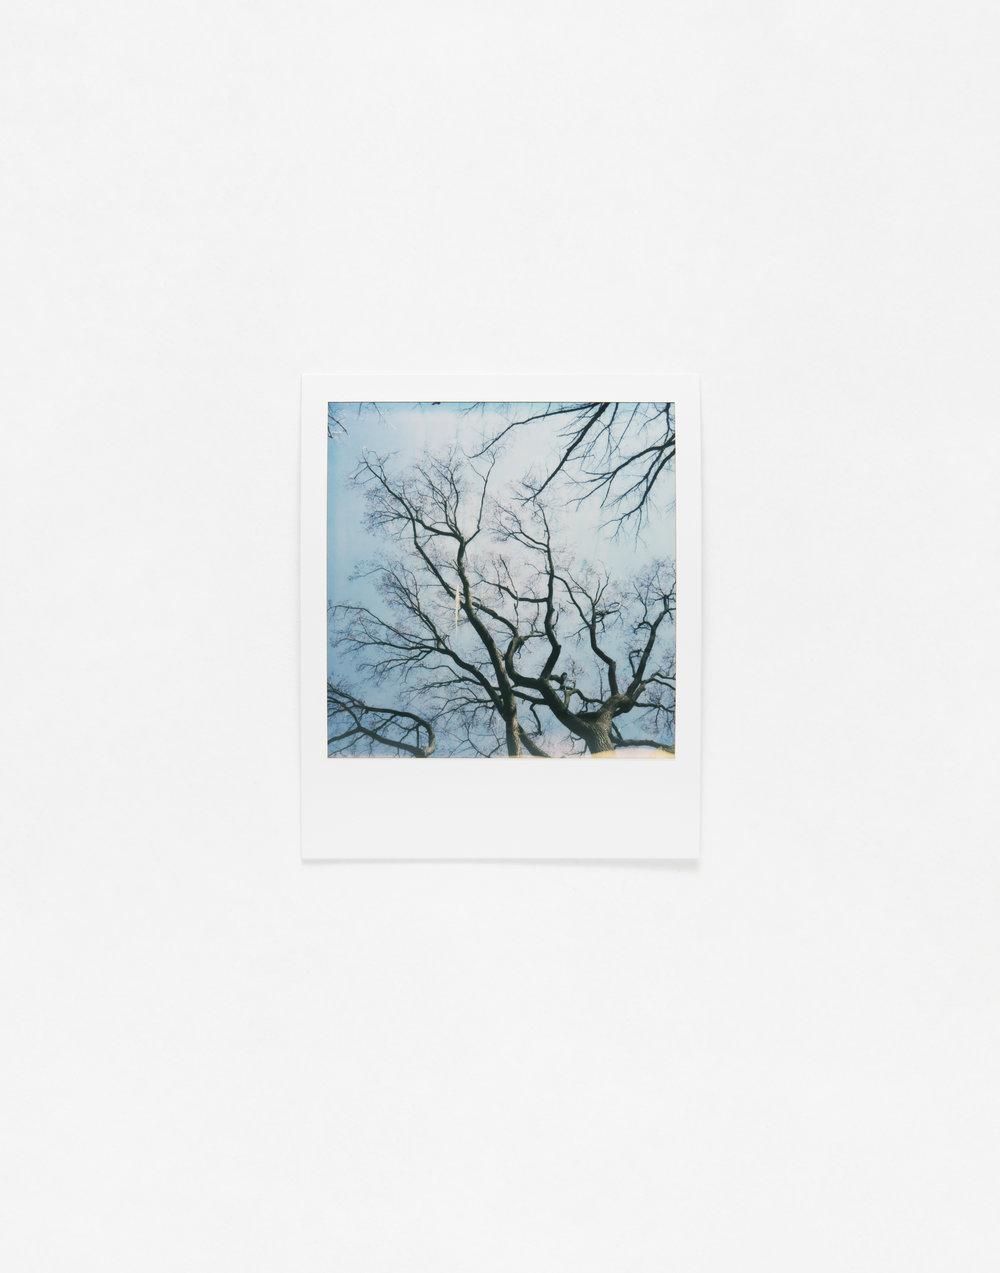 180331_Polaroid_0020.jpg